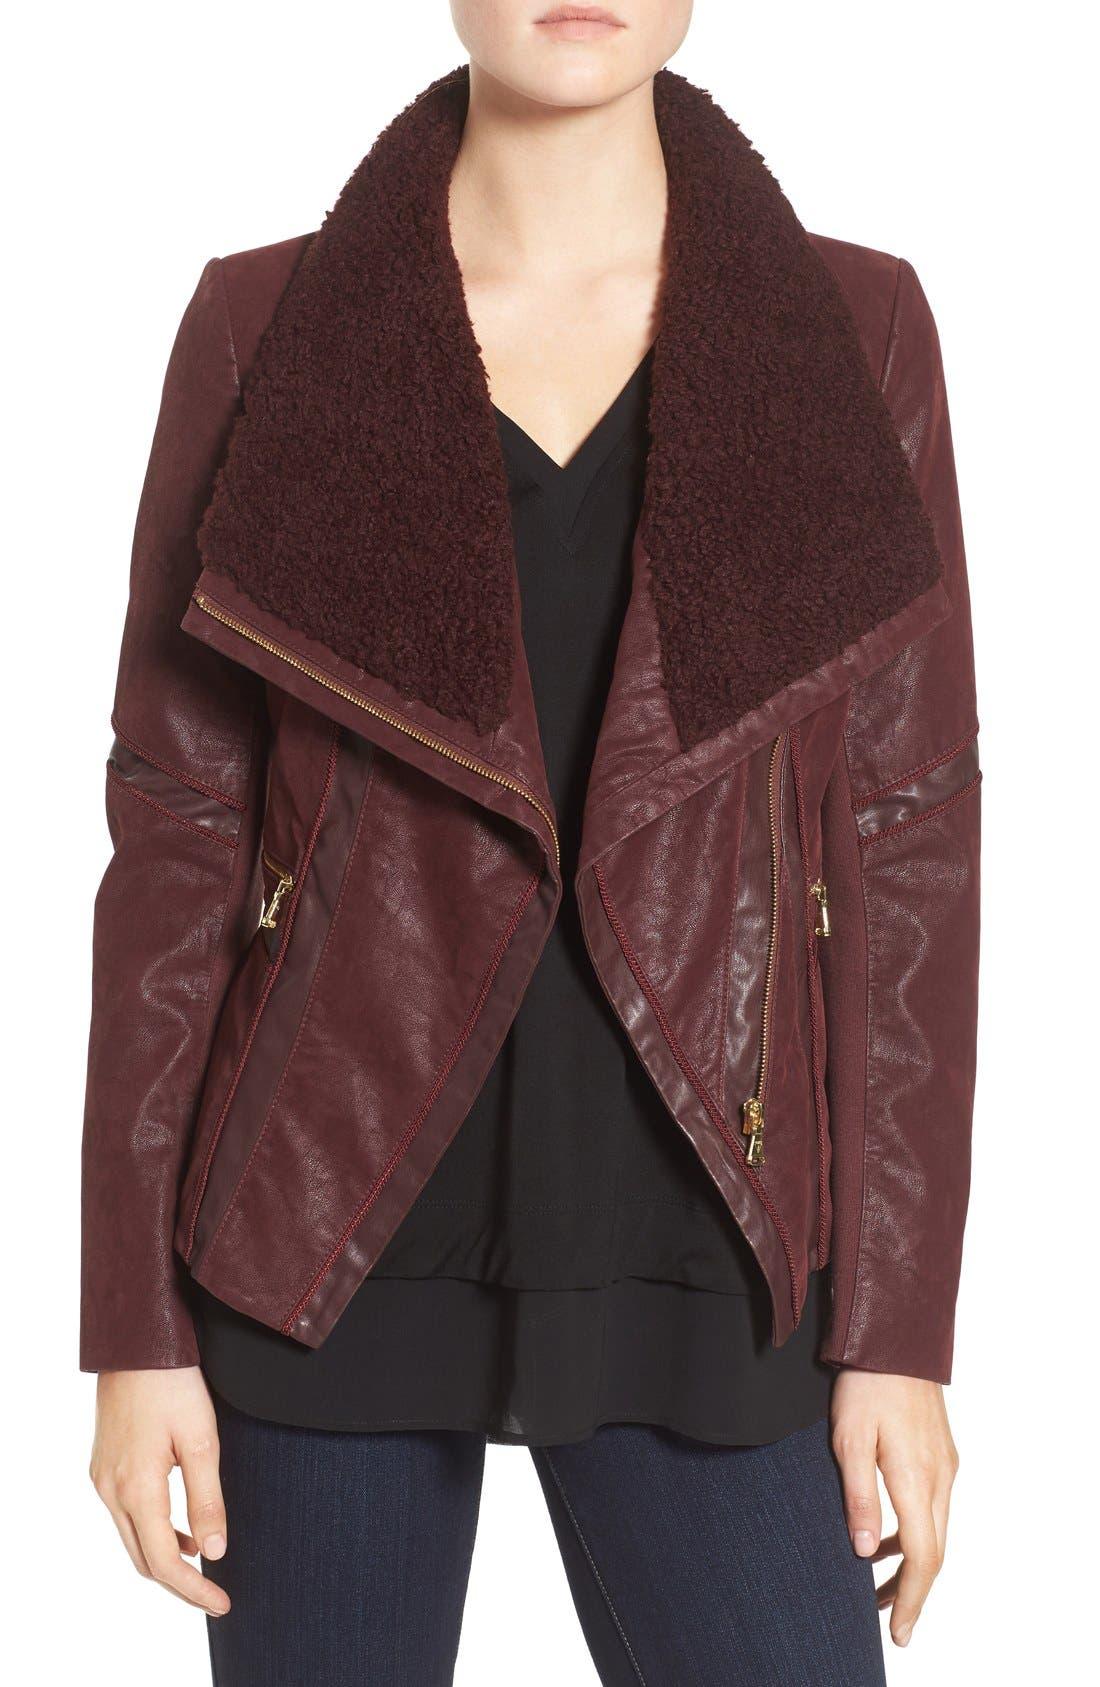 GUESS Faux Leather Moto Jacket with Faux Fur Trim